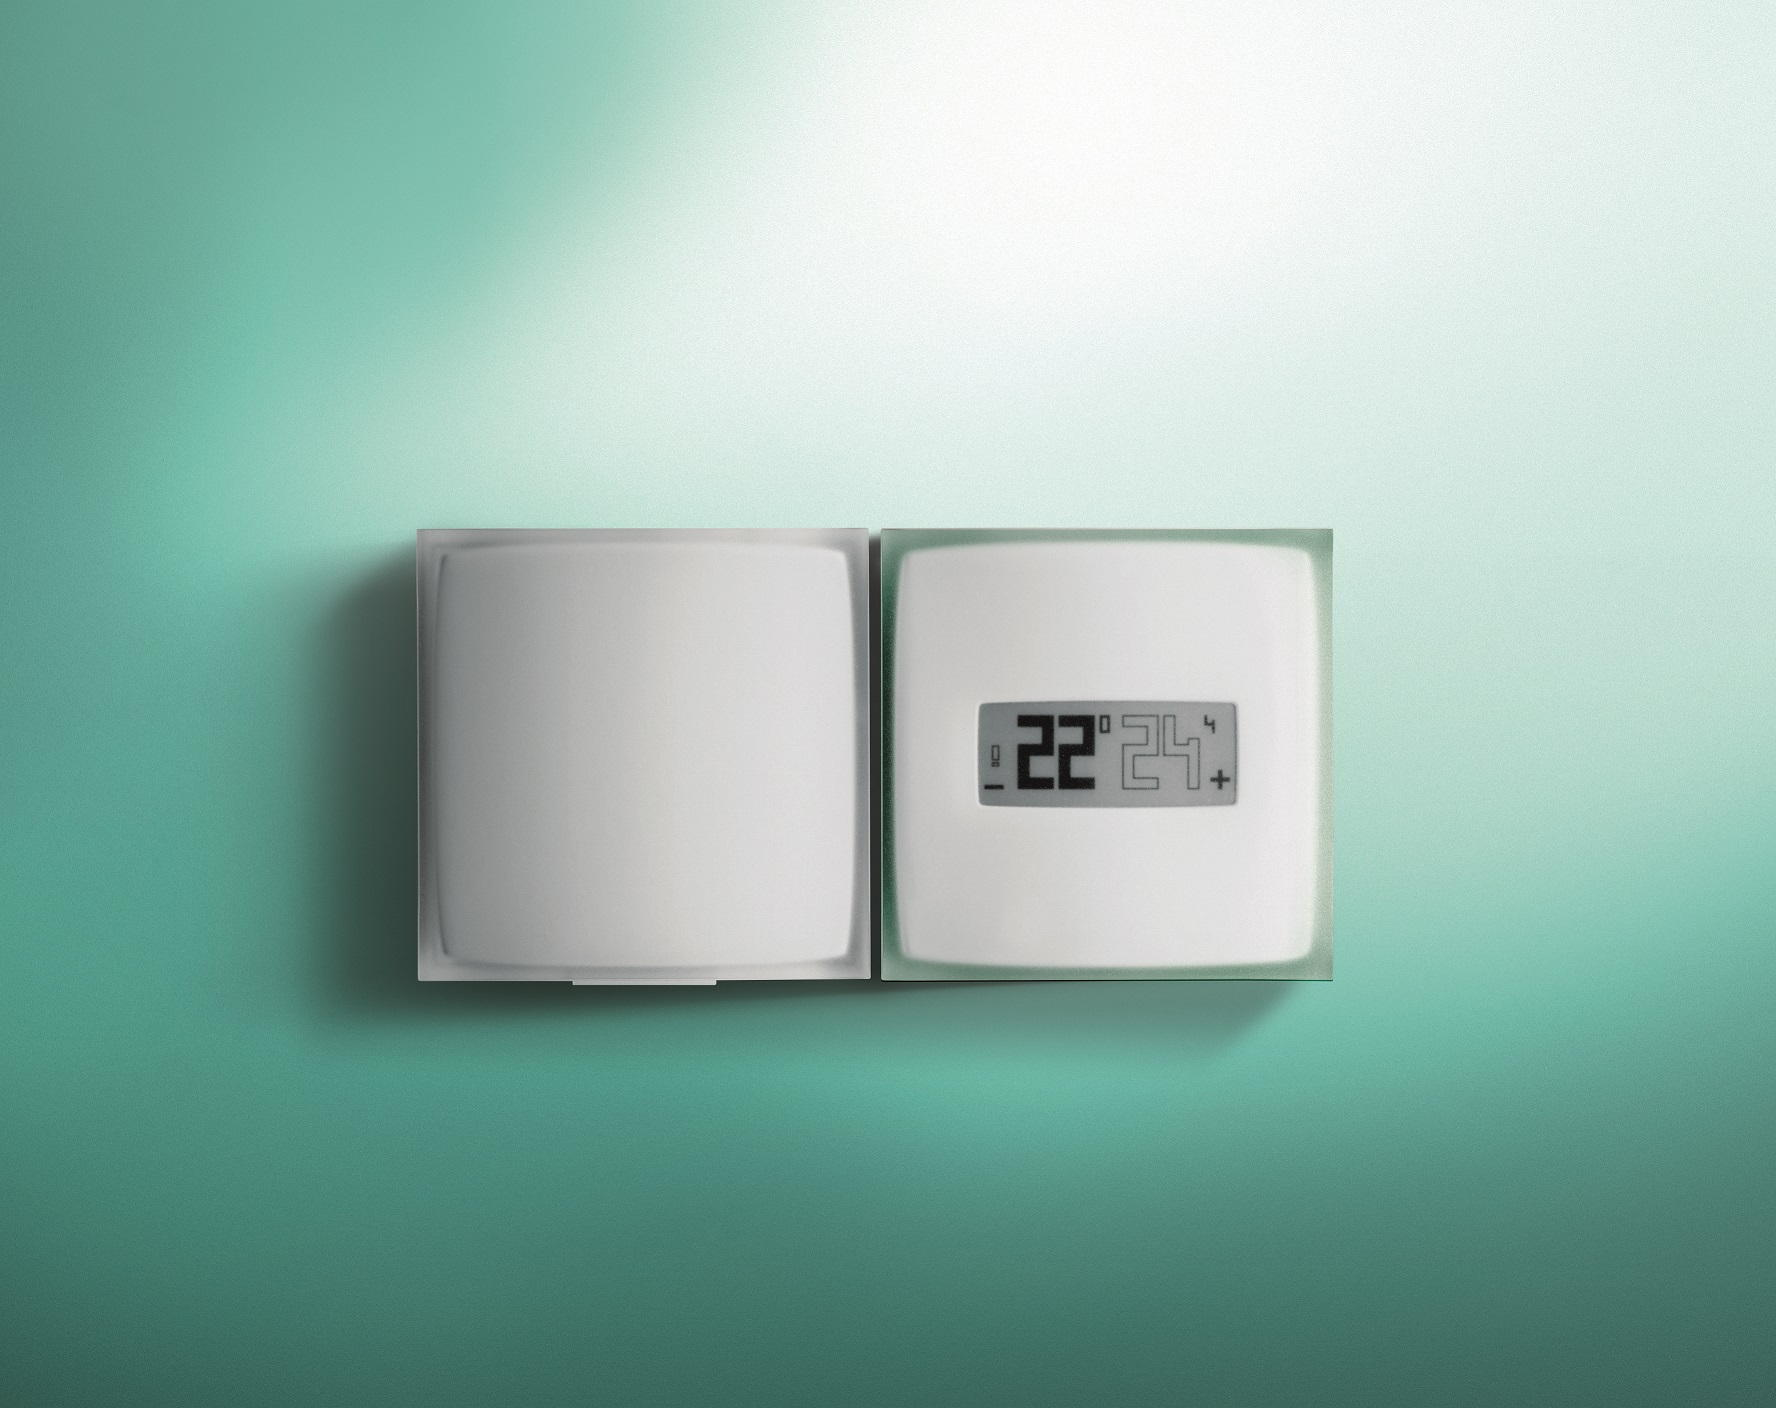 Termostato programador semanal wifi vaillant for Termostato caldera wifi